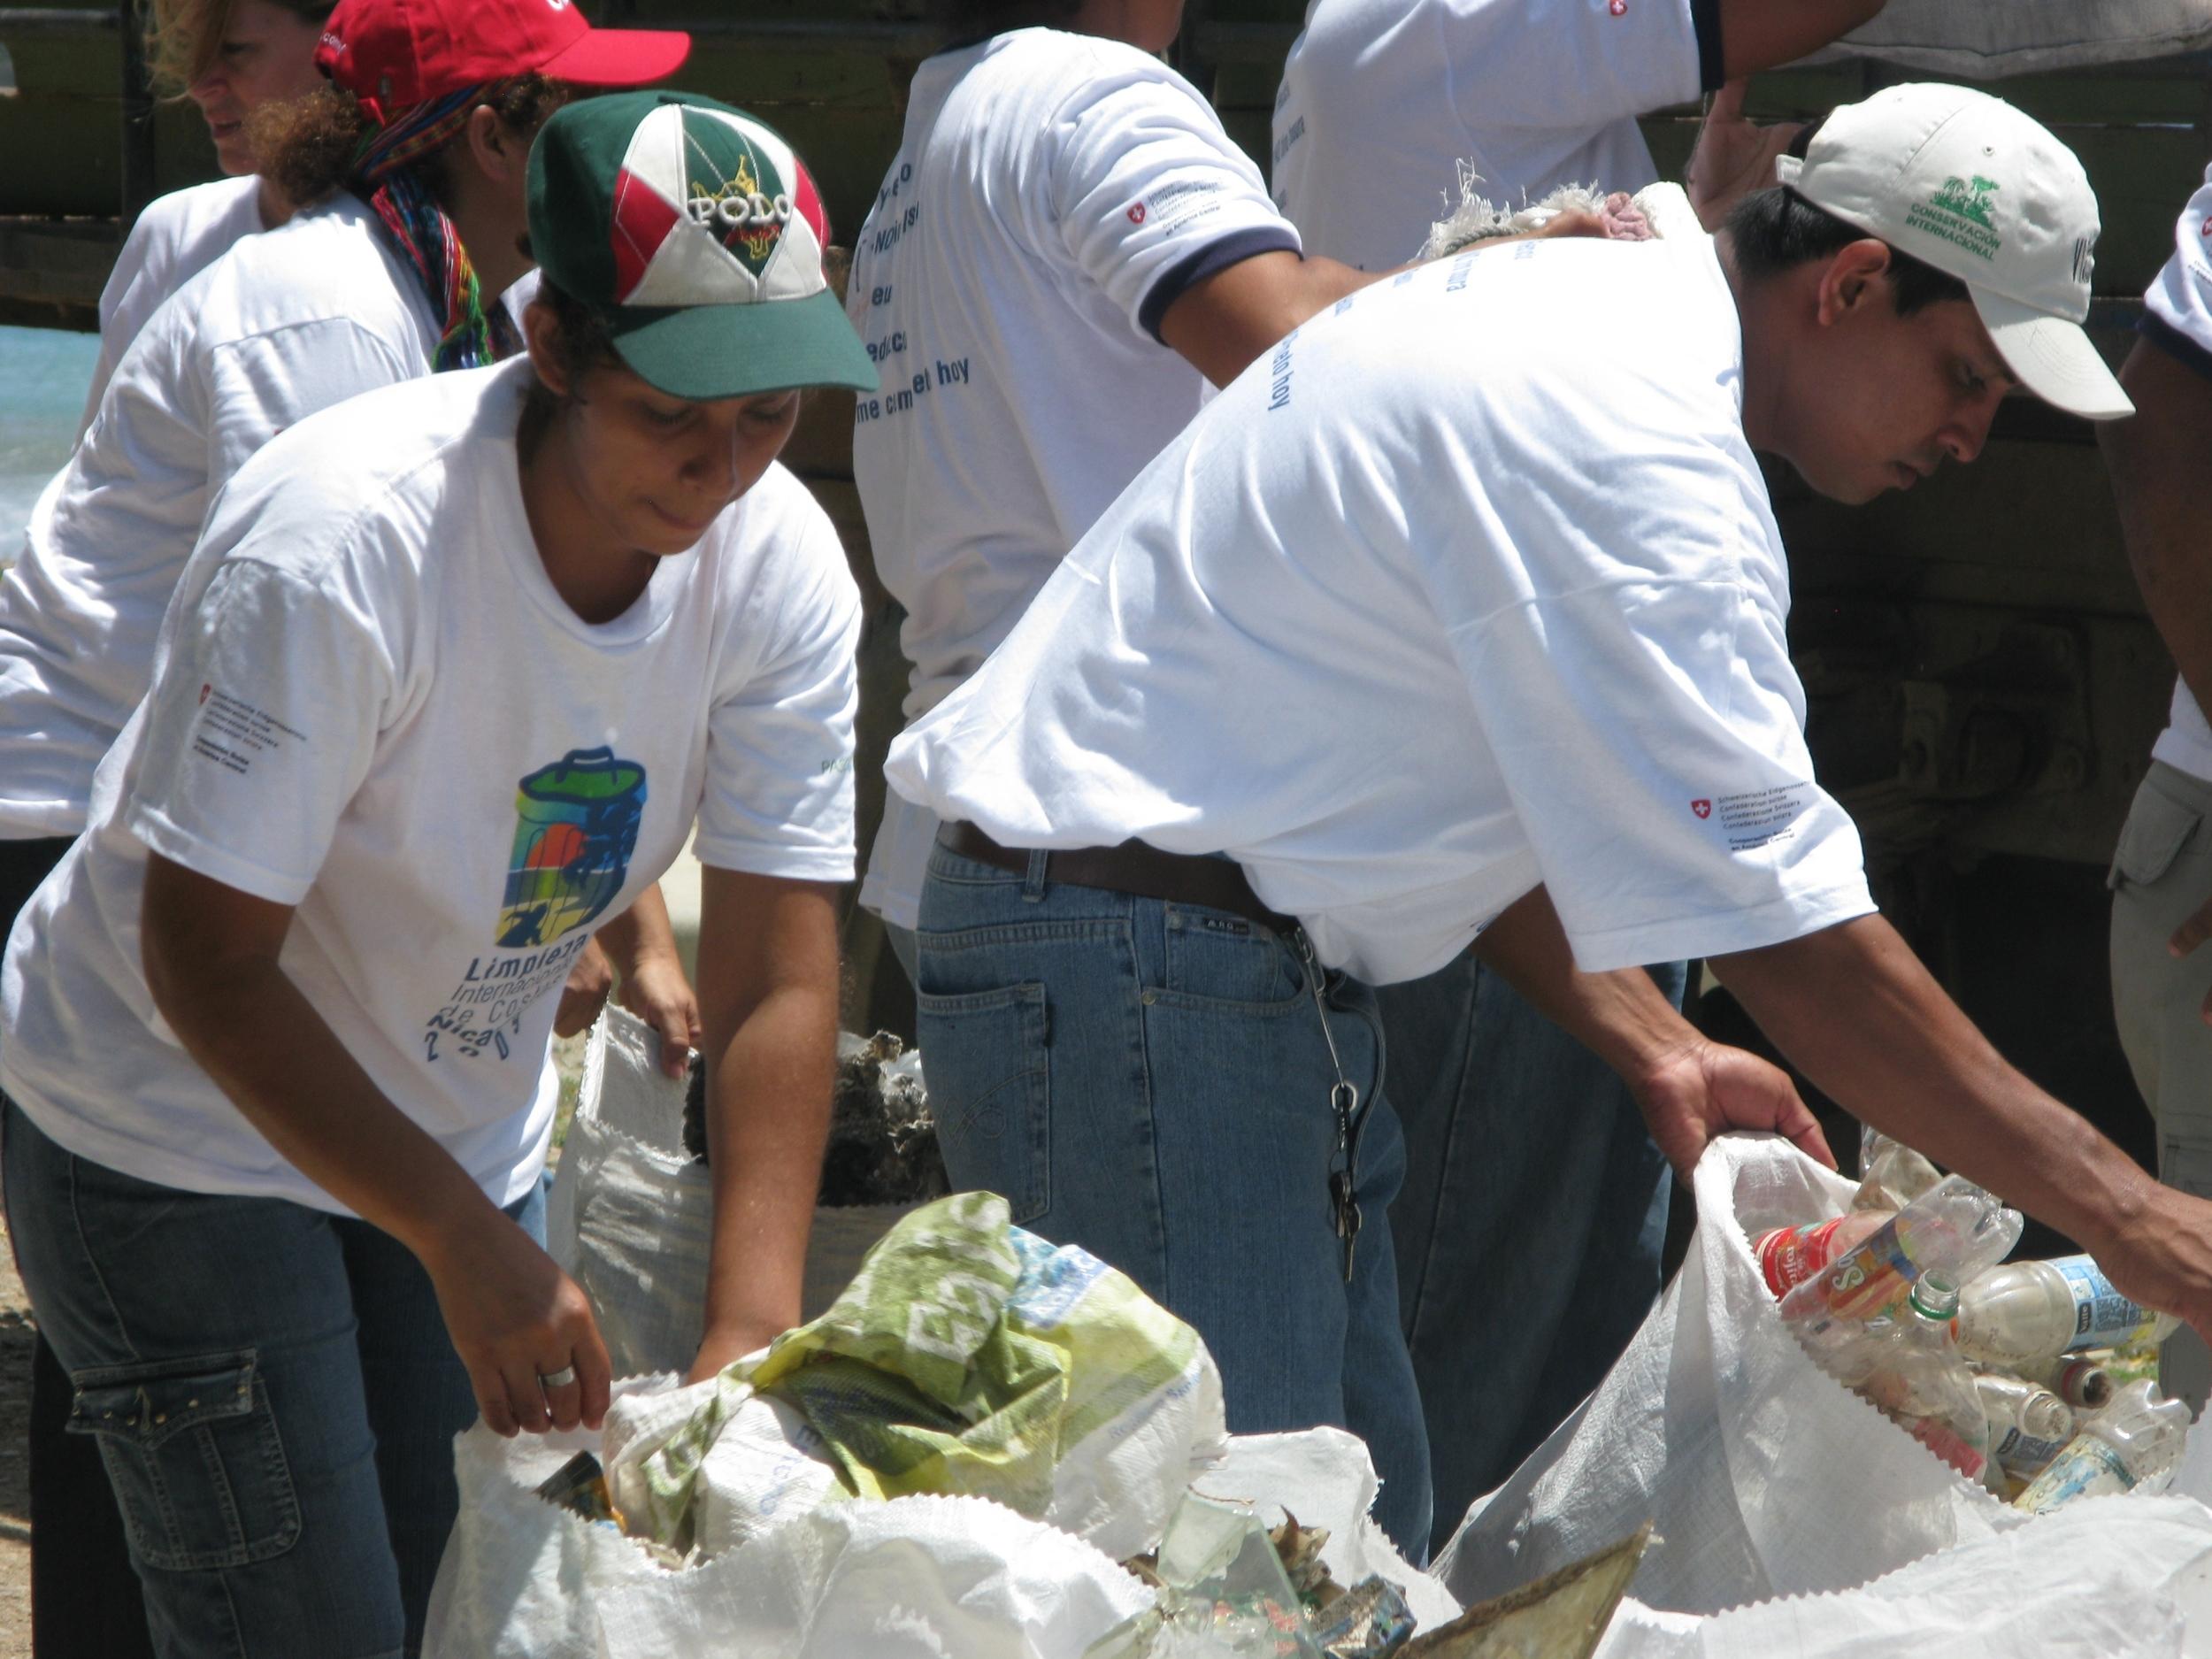 Nicaragua - Paso Pacifico - ICC2009 - 3.JPG